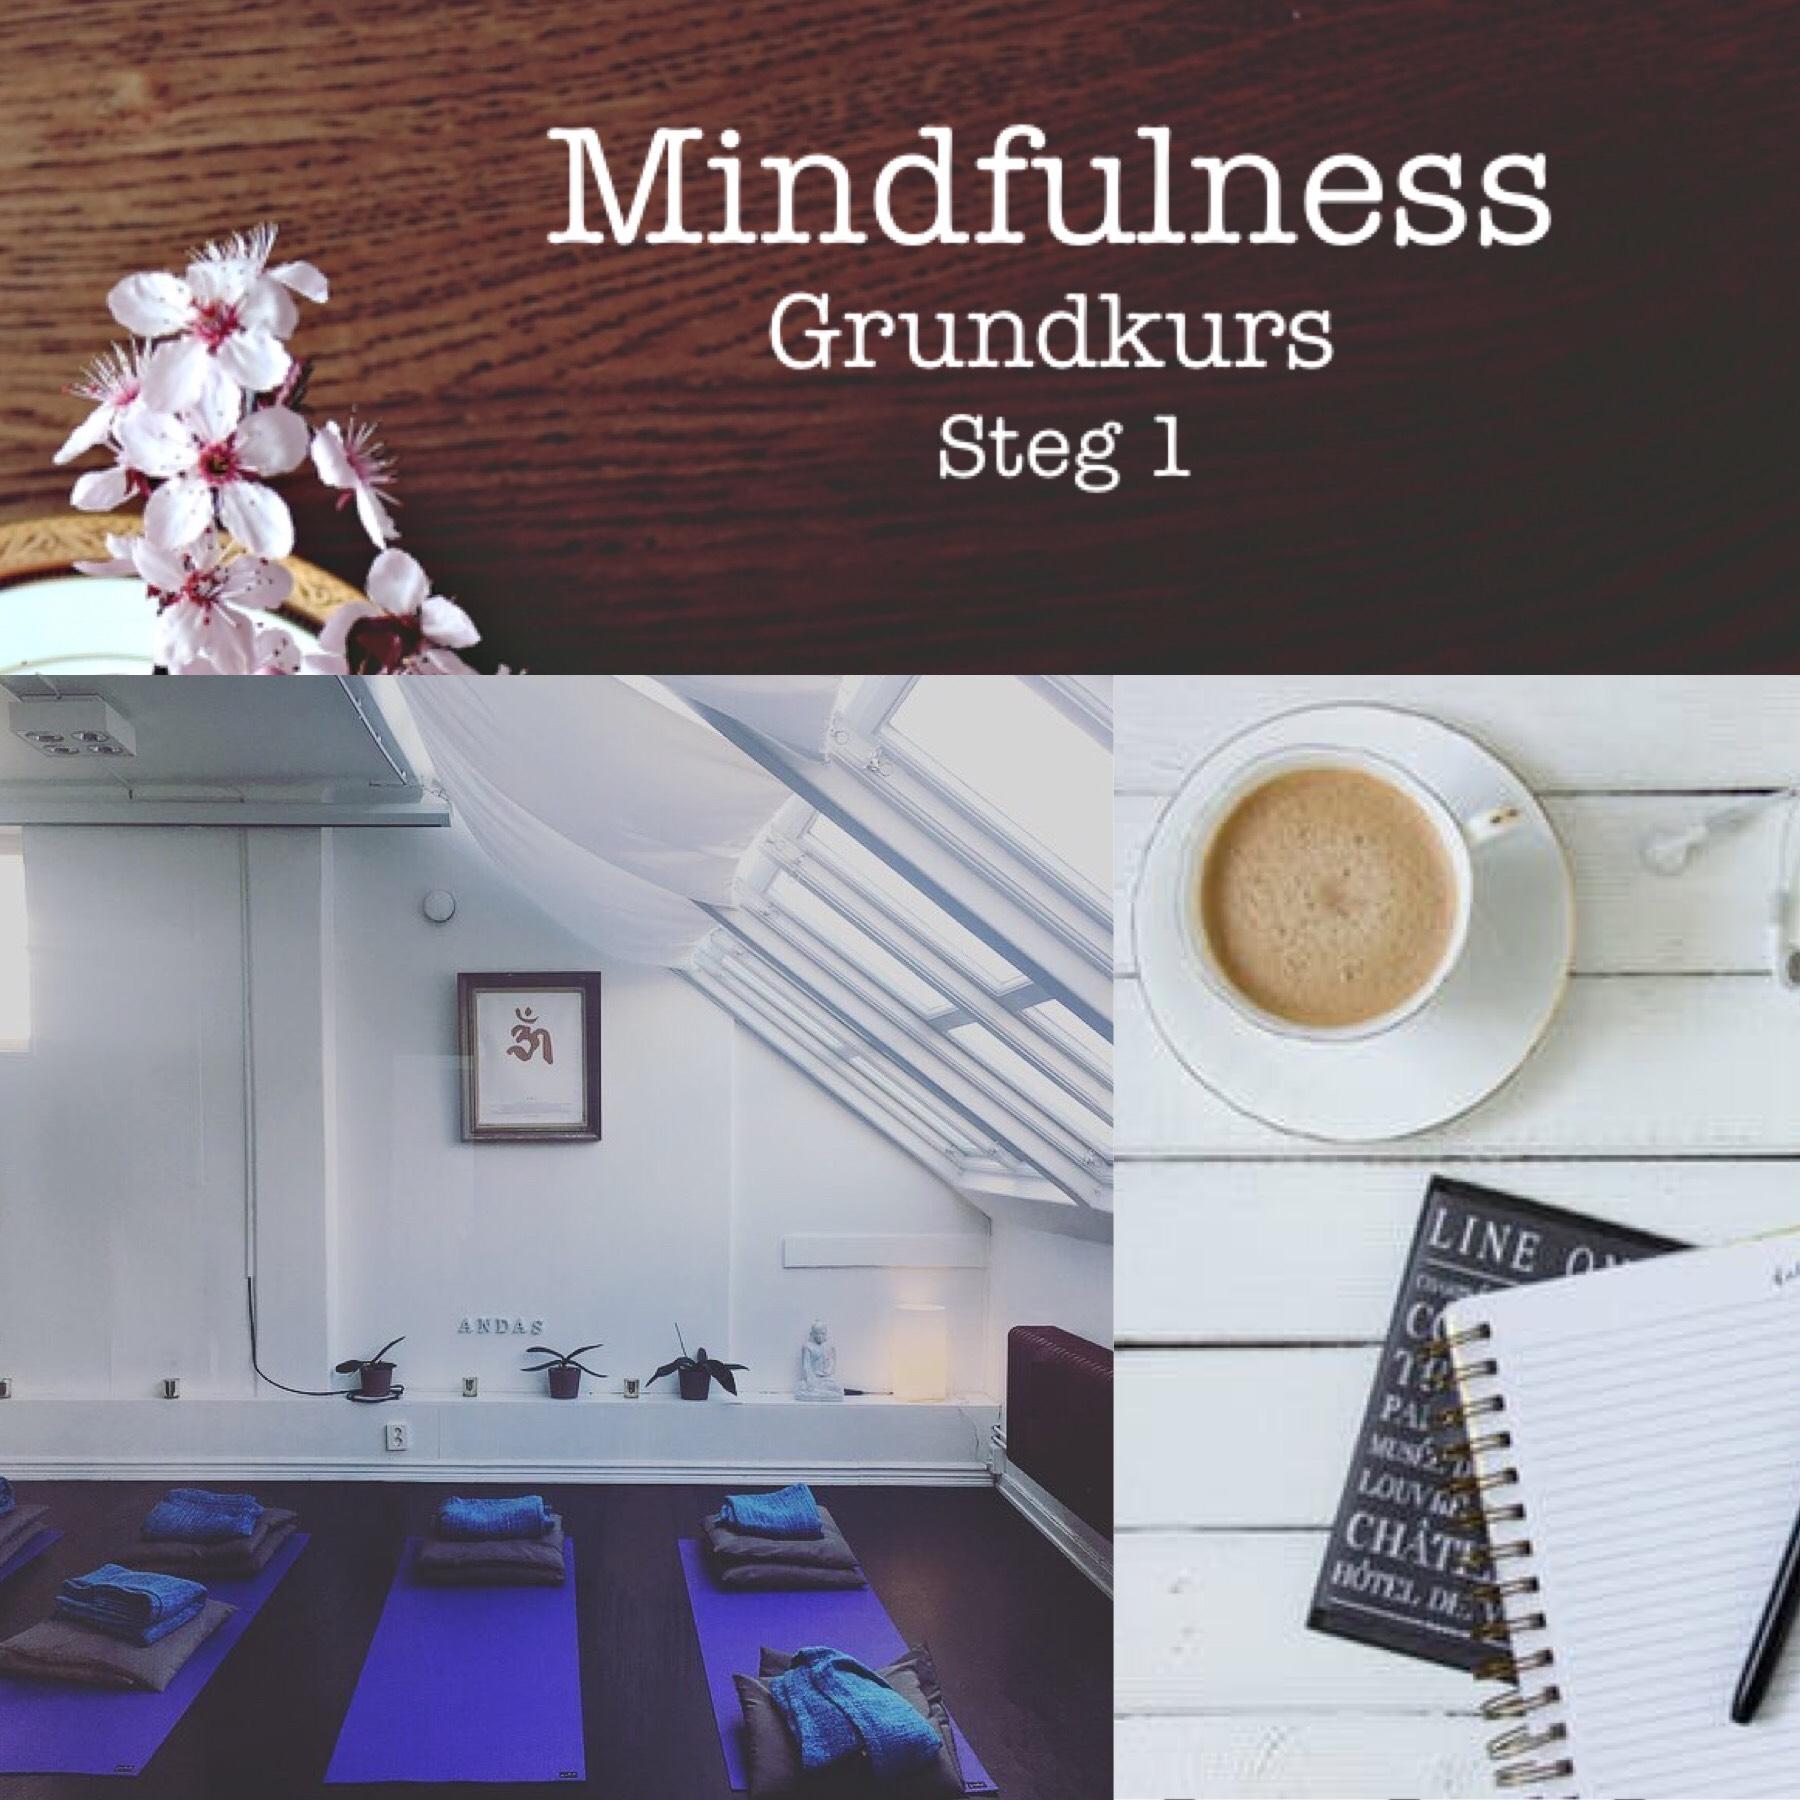 grundkurs mindfulness bild